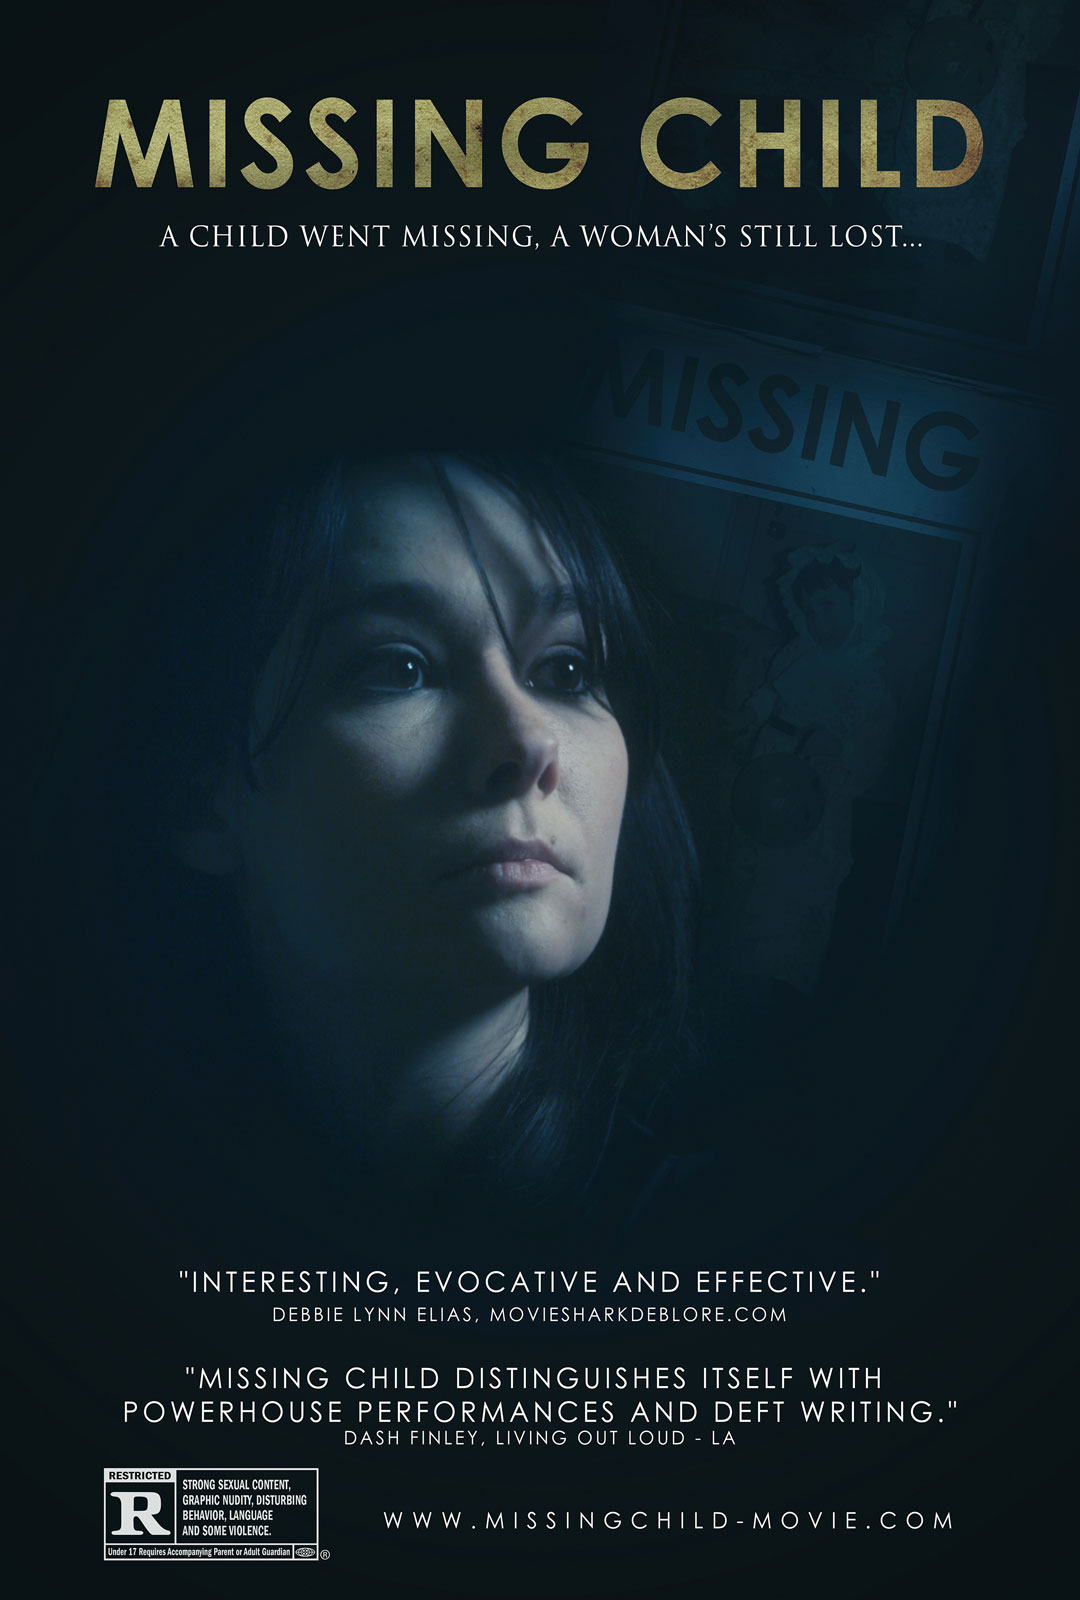 Missing Child, Independent Thriller